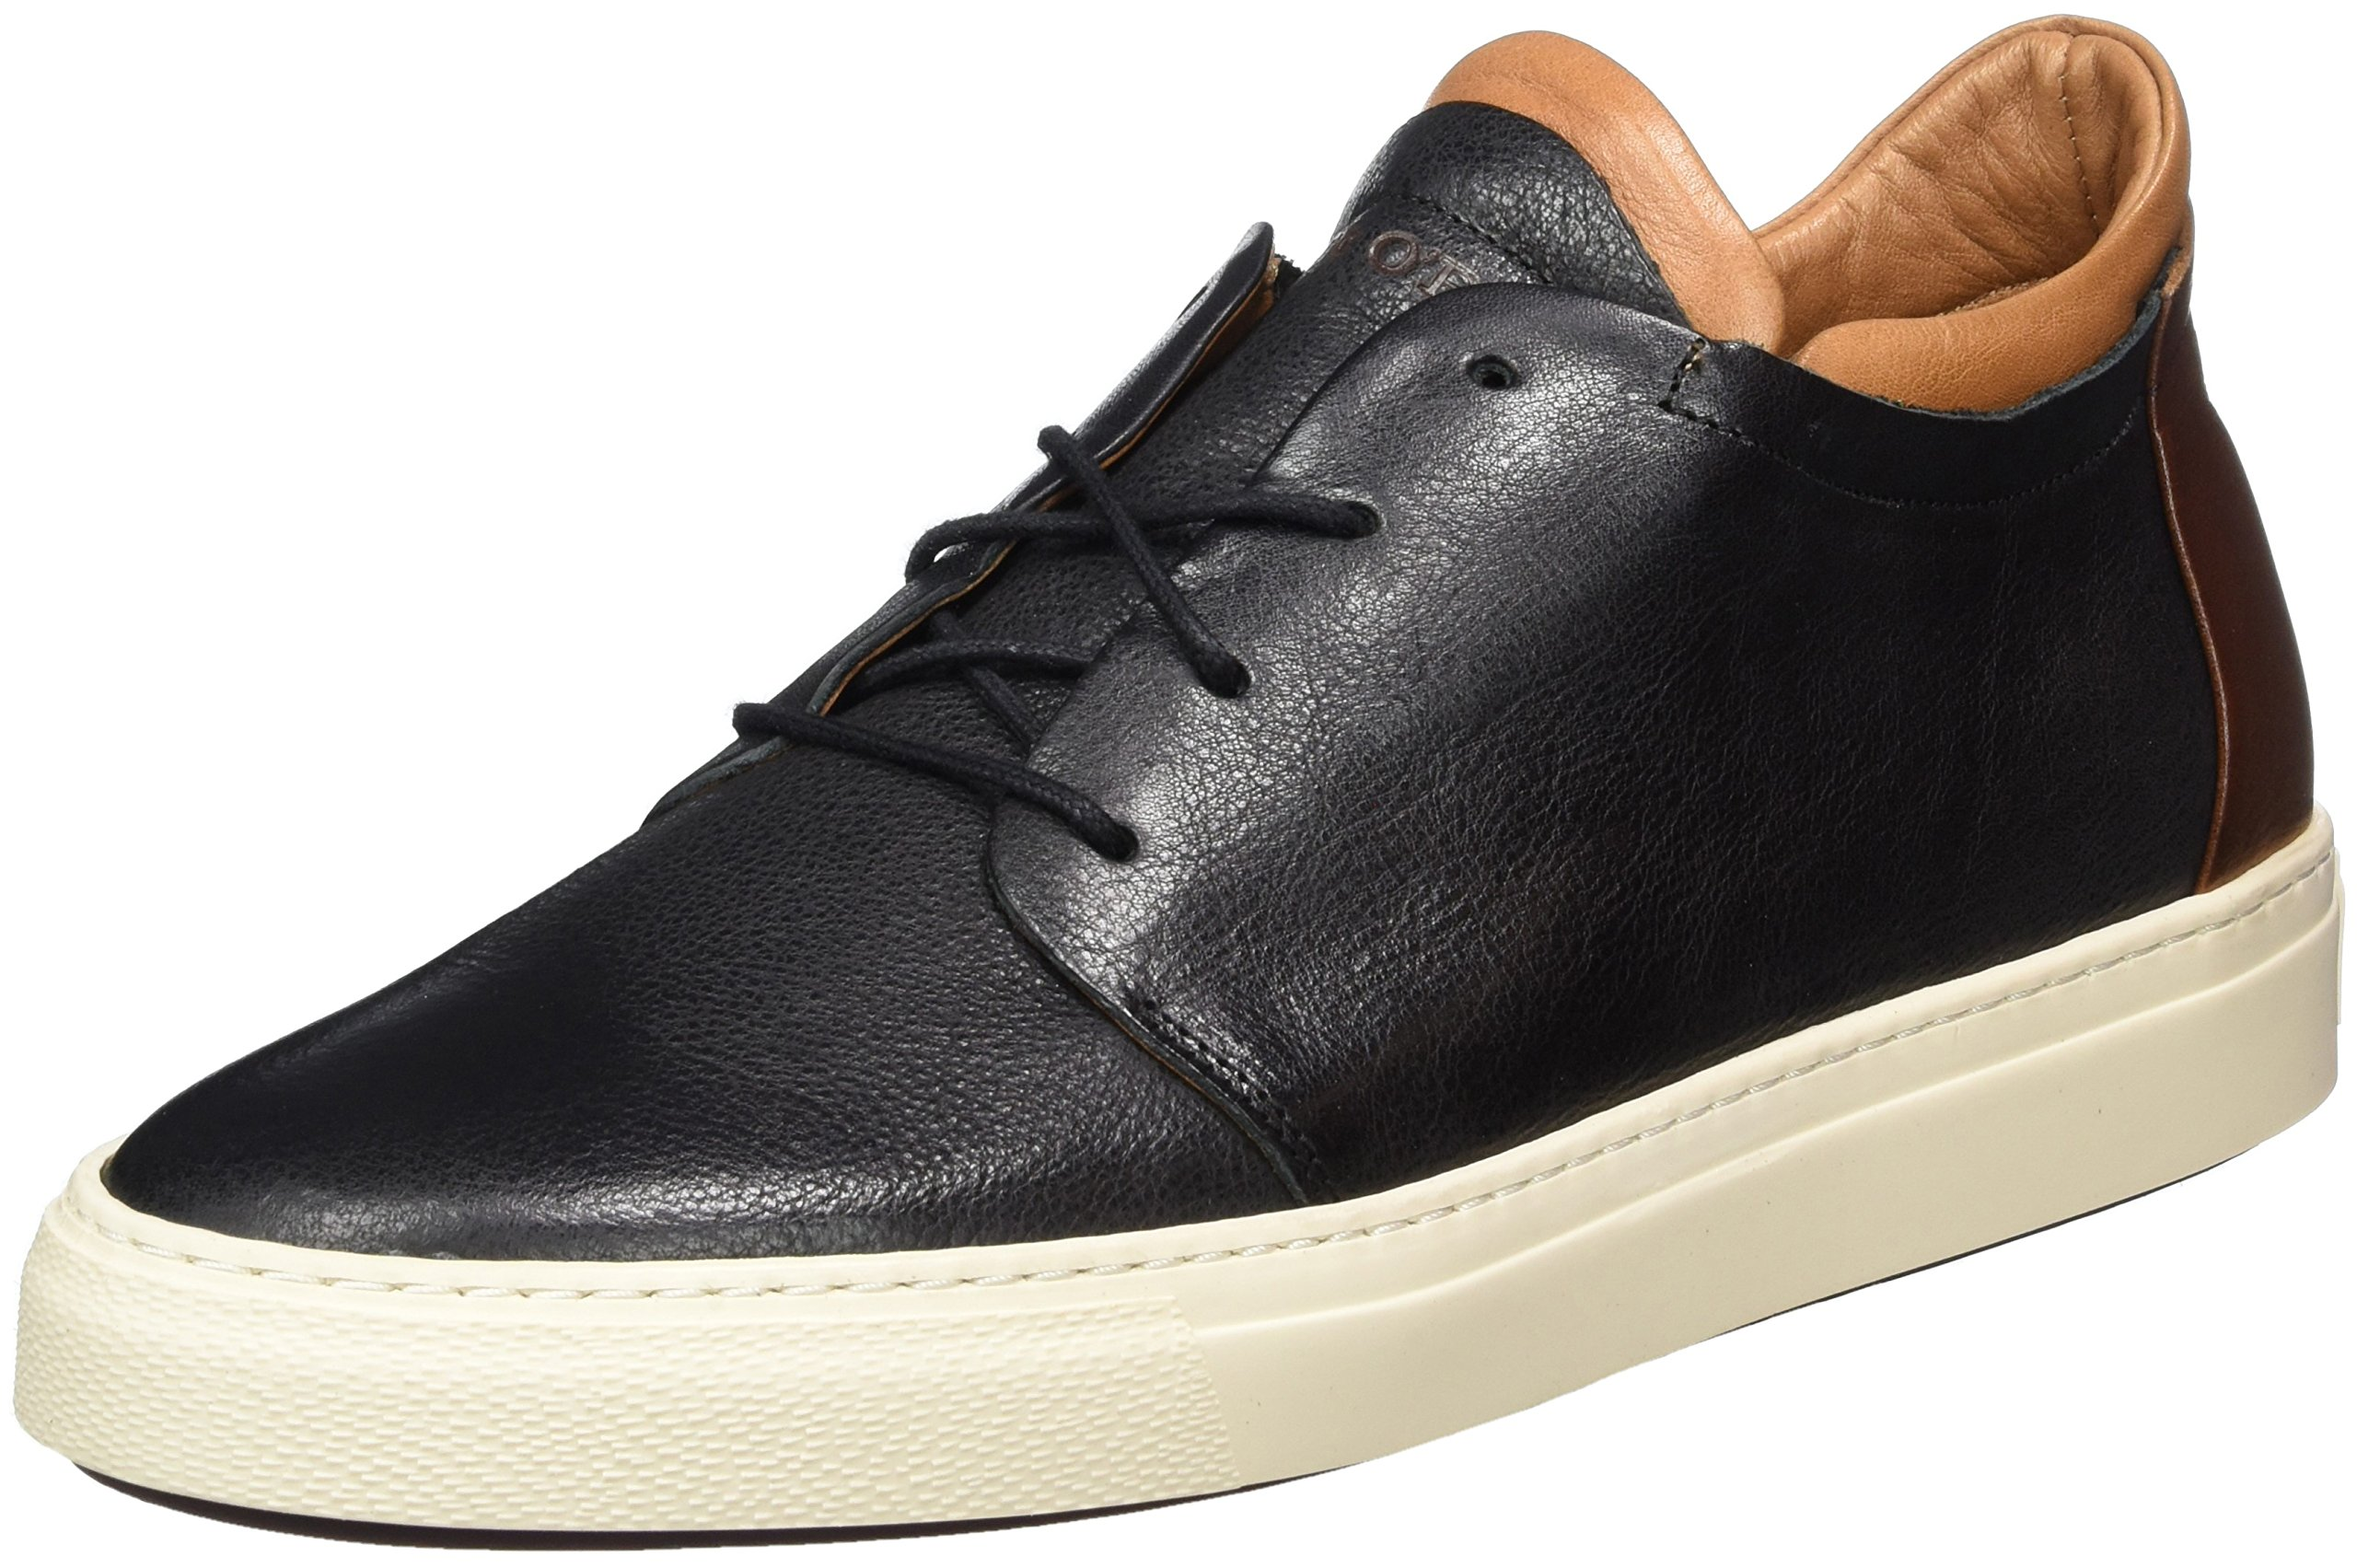 70723743502103Baskets Sneaker Eu O'polo HommeSchwarzblack40 Hautes Marc UVqGzpLSMj